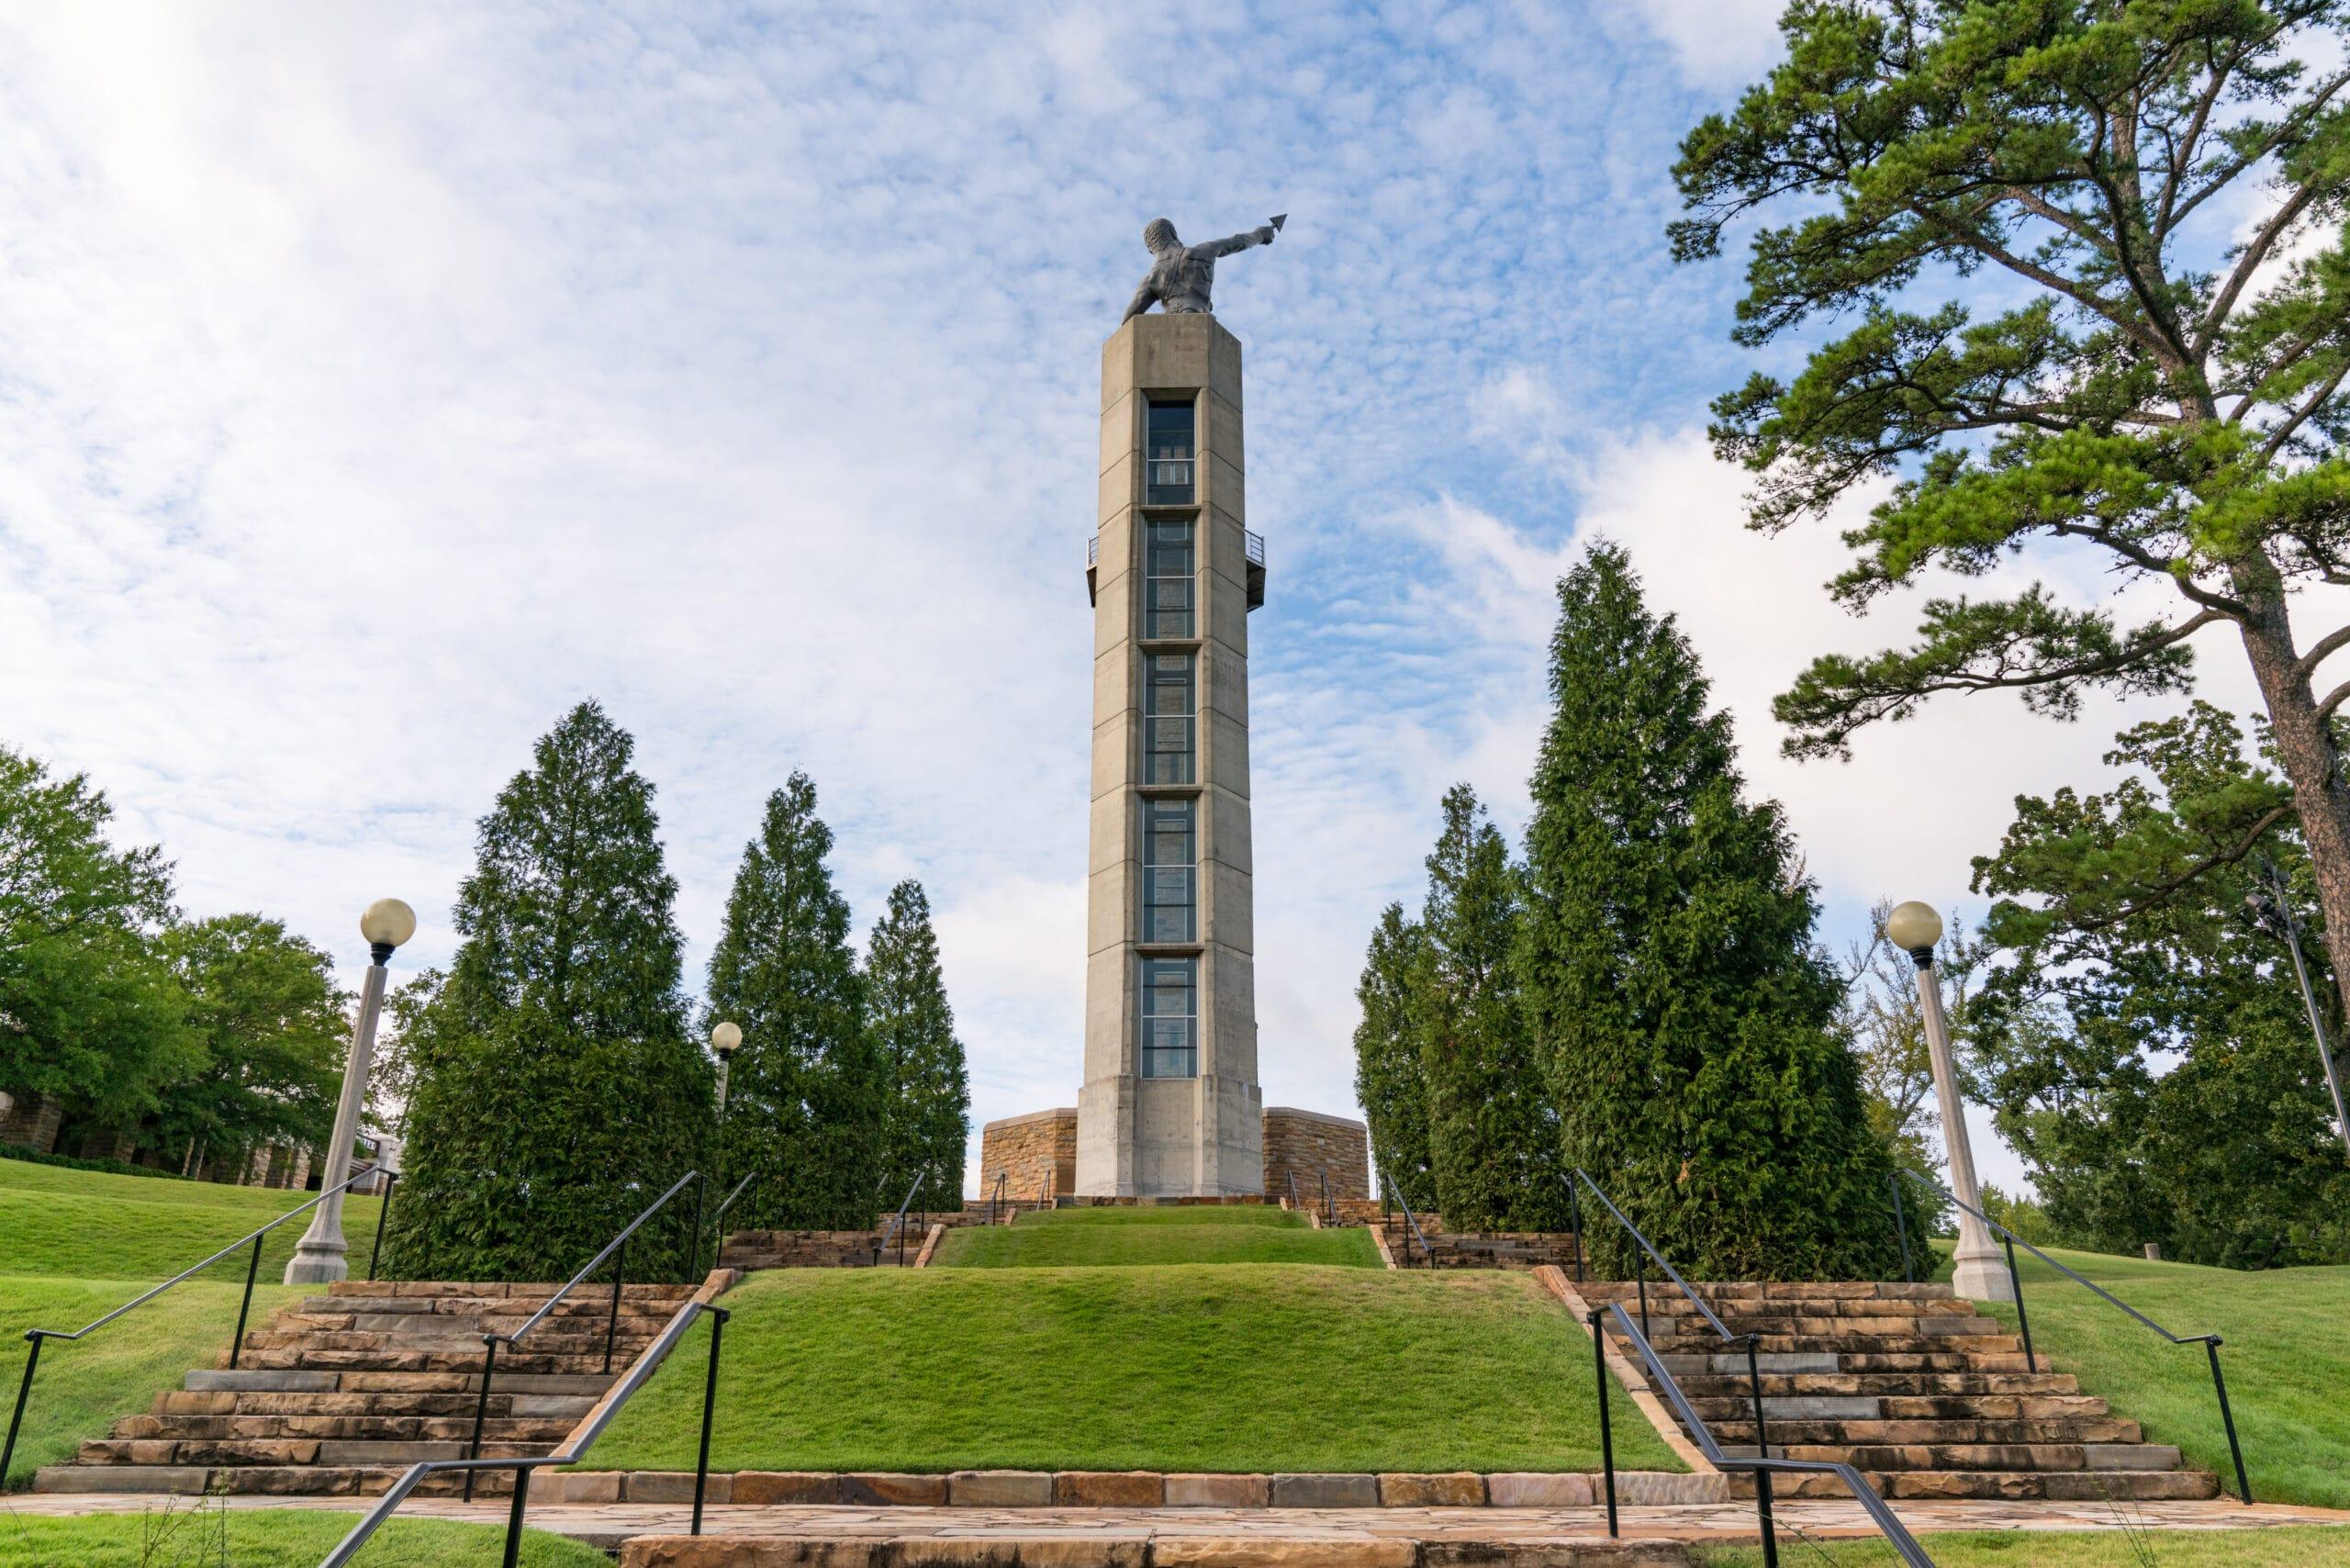 Birmingham, AL - October 7, 2019: Observation Tower in Vulcan Park in Birmingham, Alabama